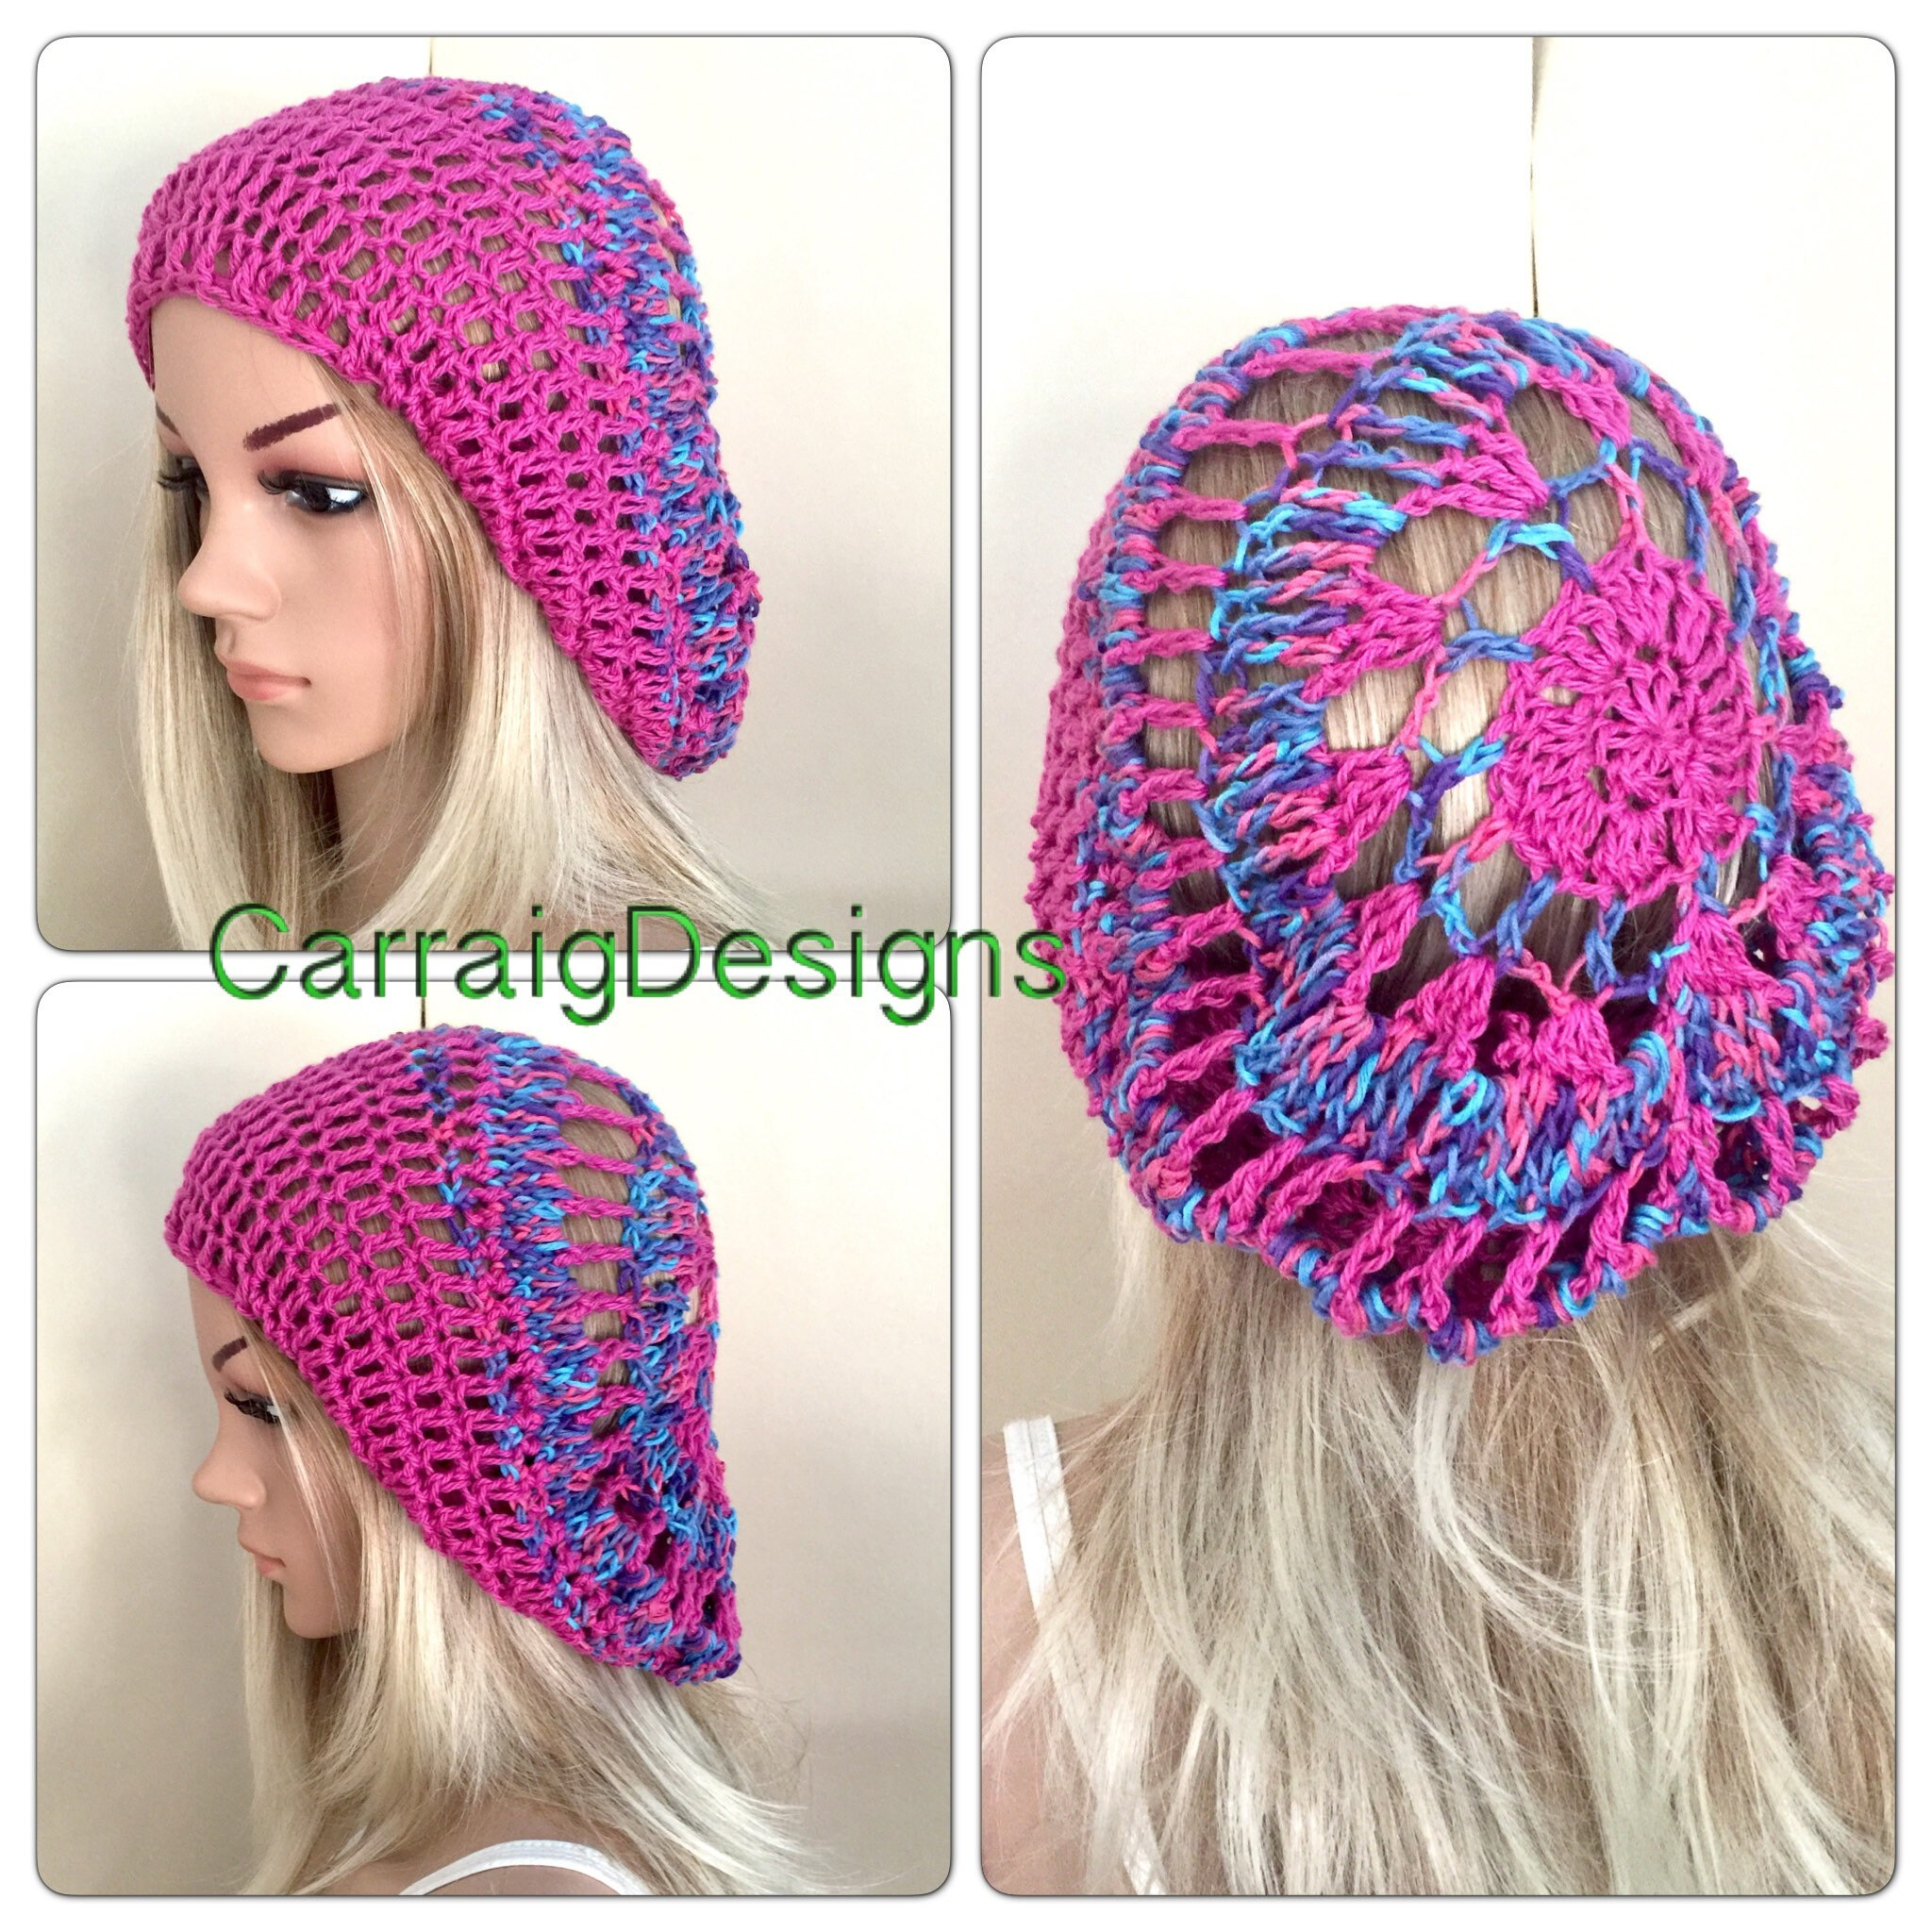 c386ca2175a31 Cotton summer beret crochet spring teens handmade knit oversized slouch  beanie hat circle mandala dread tam unique designer pink earth Irish